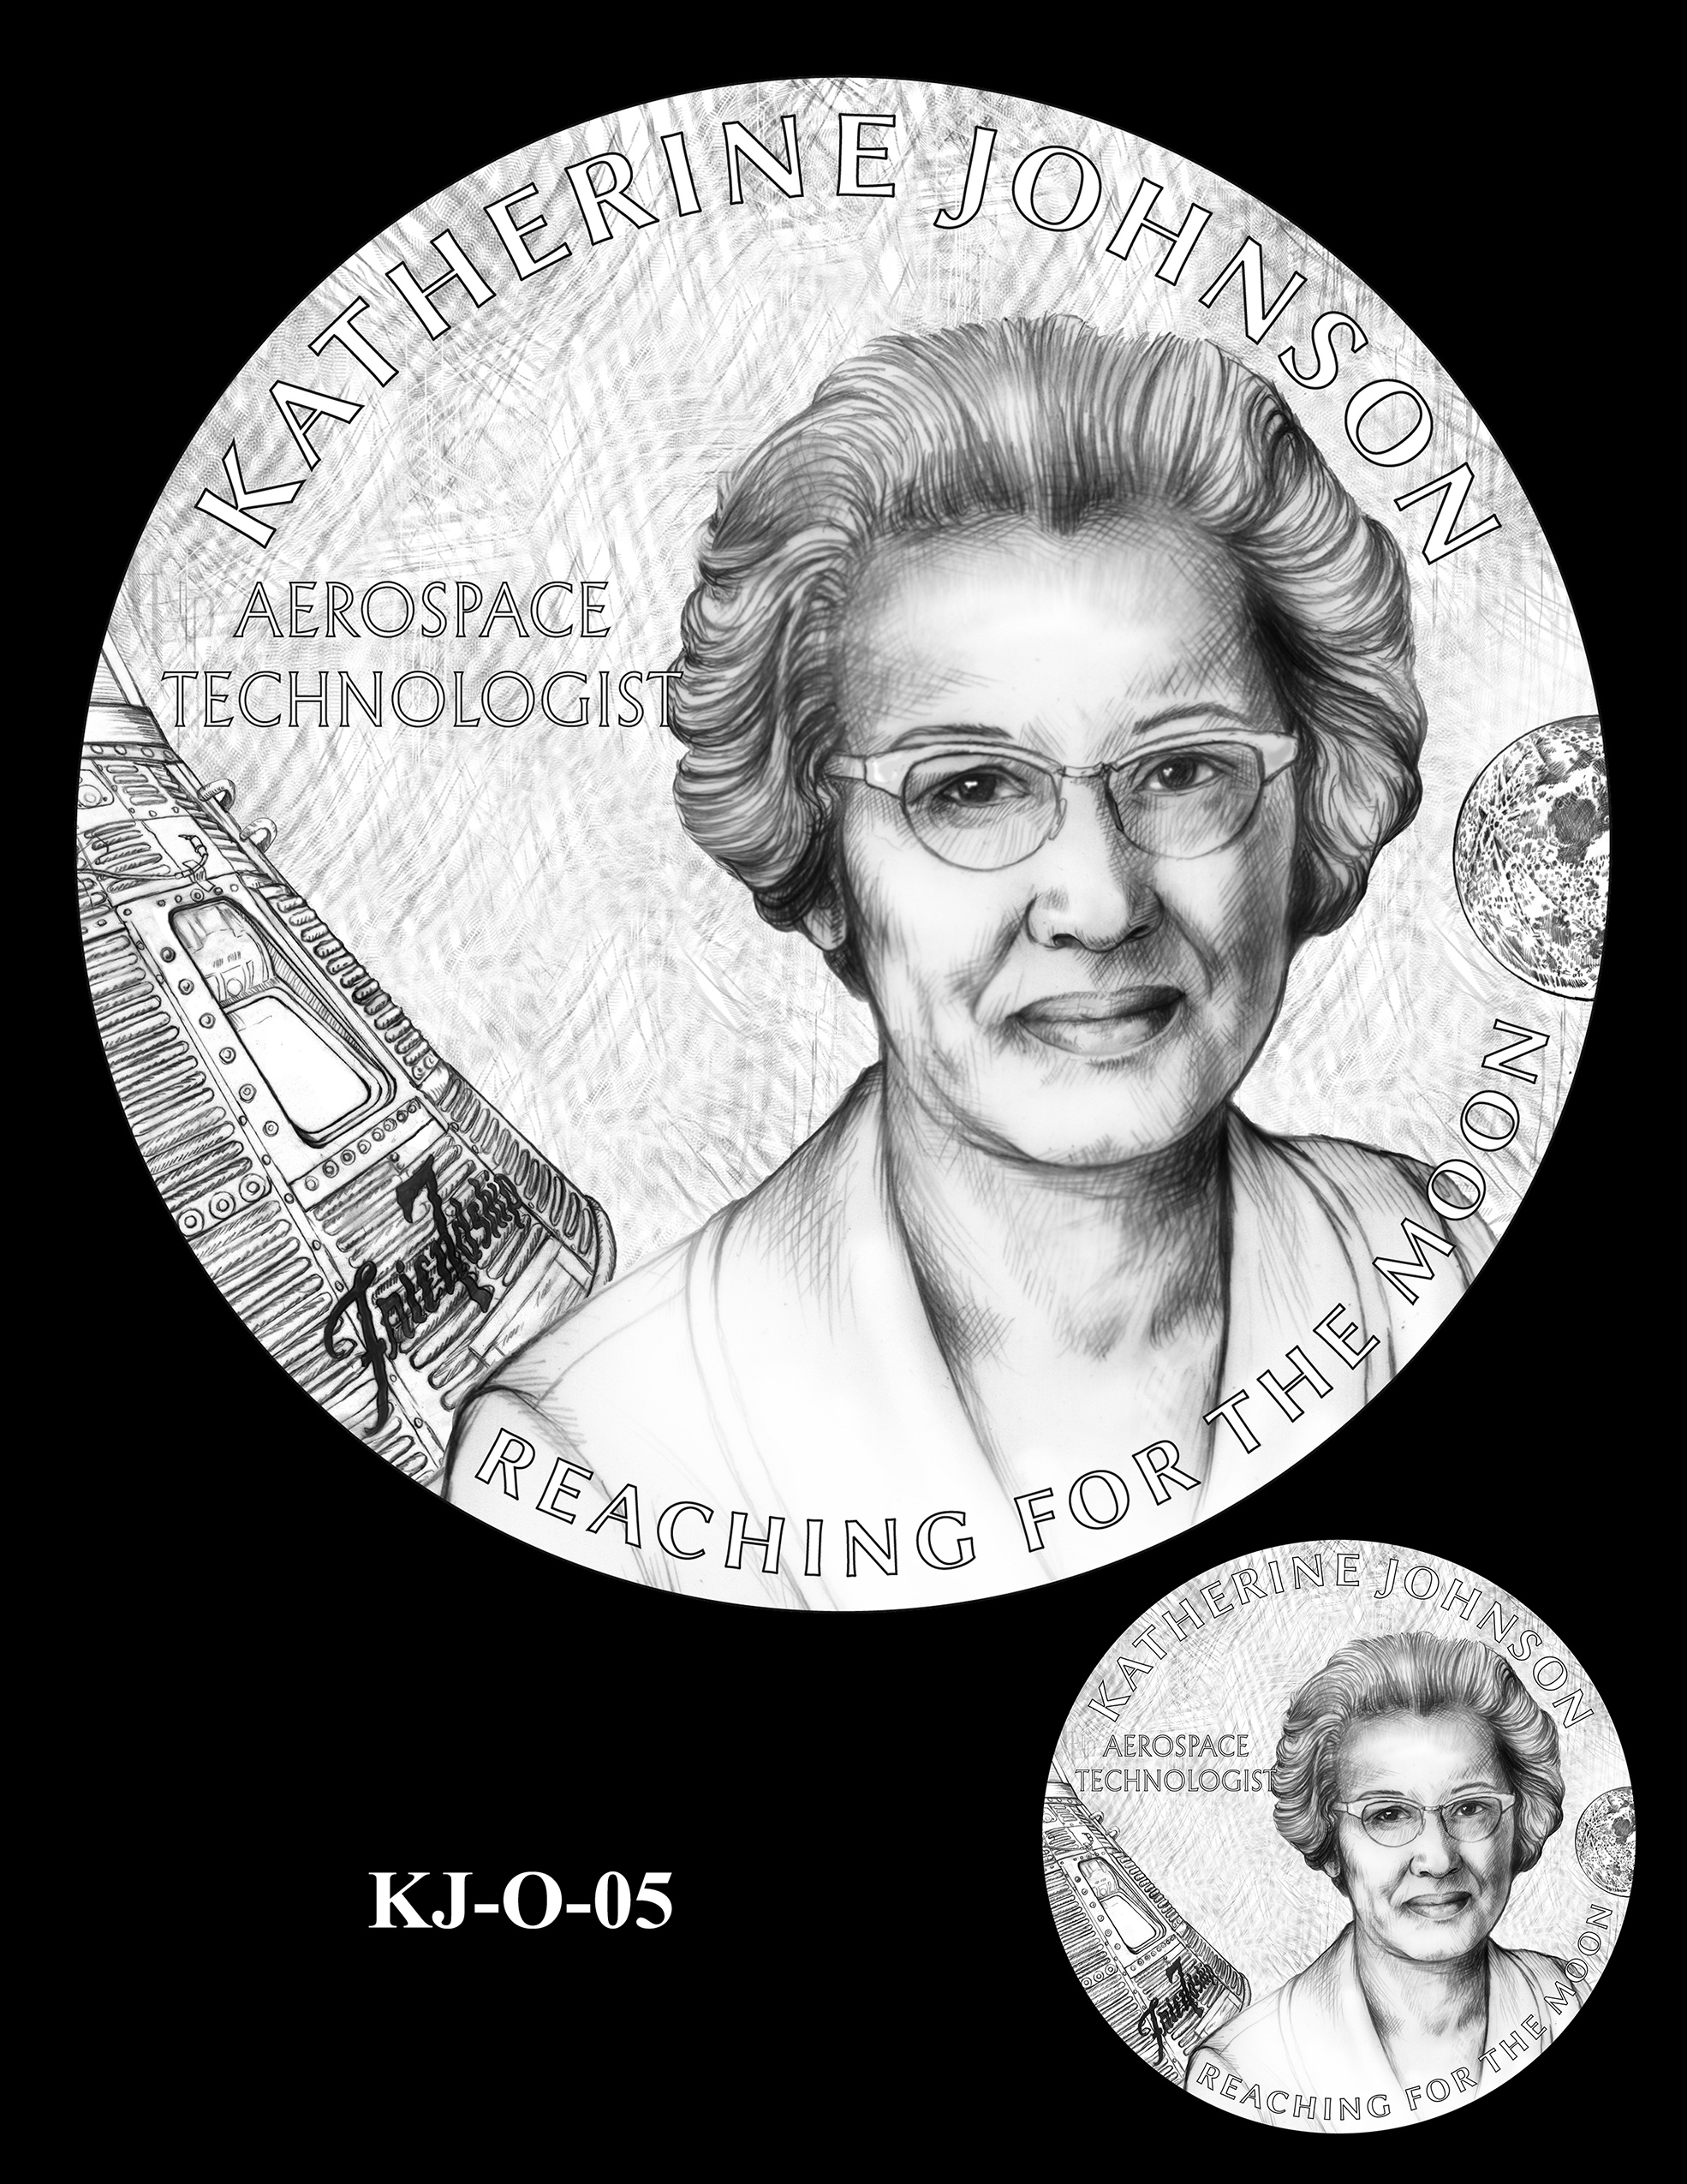 KJ-O-05 -- Katherine Johnson Congressional Gold Medal